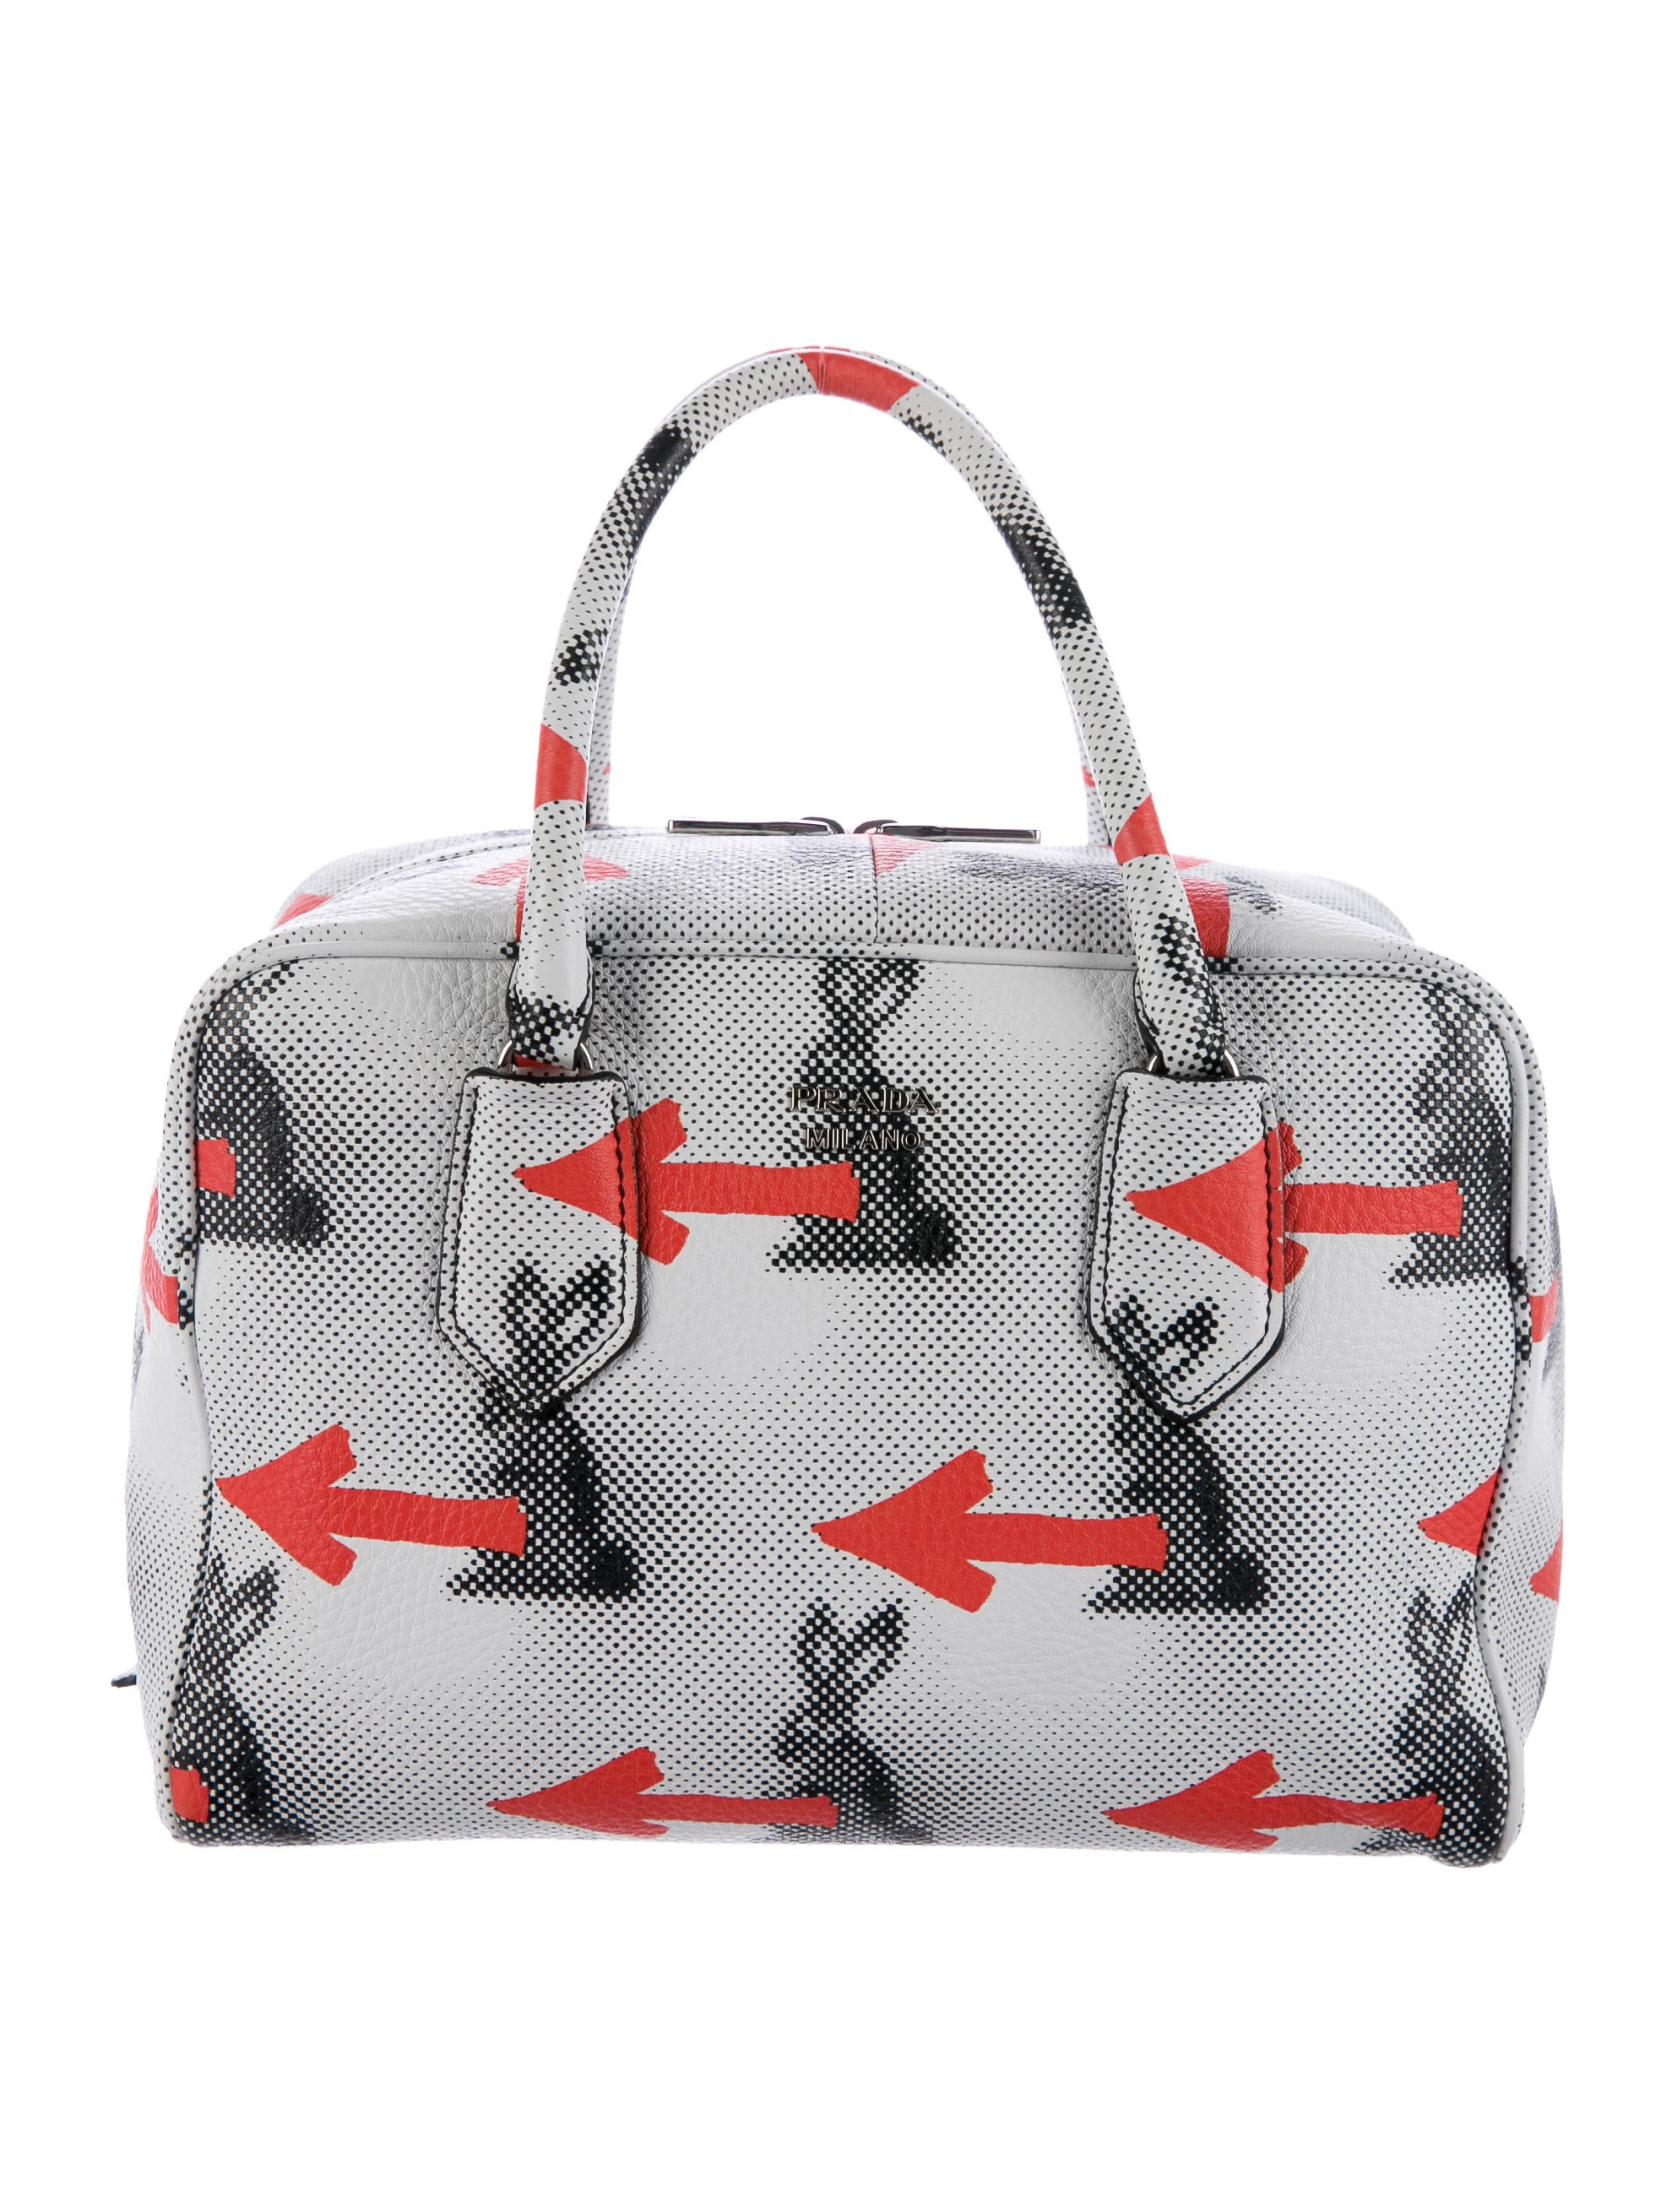 Prada Daino St. Rabbits Inside Bag - Handbags - PRA162359   The RealReal c3f16d0f03